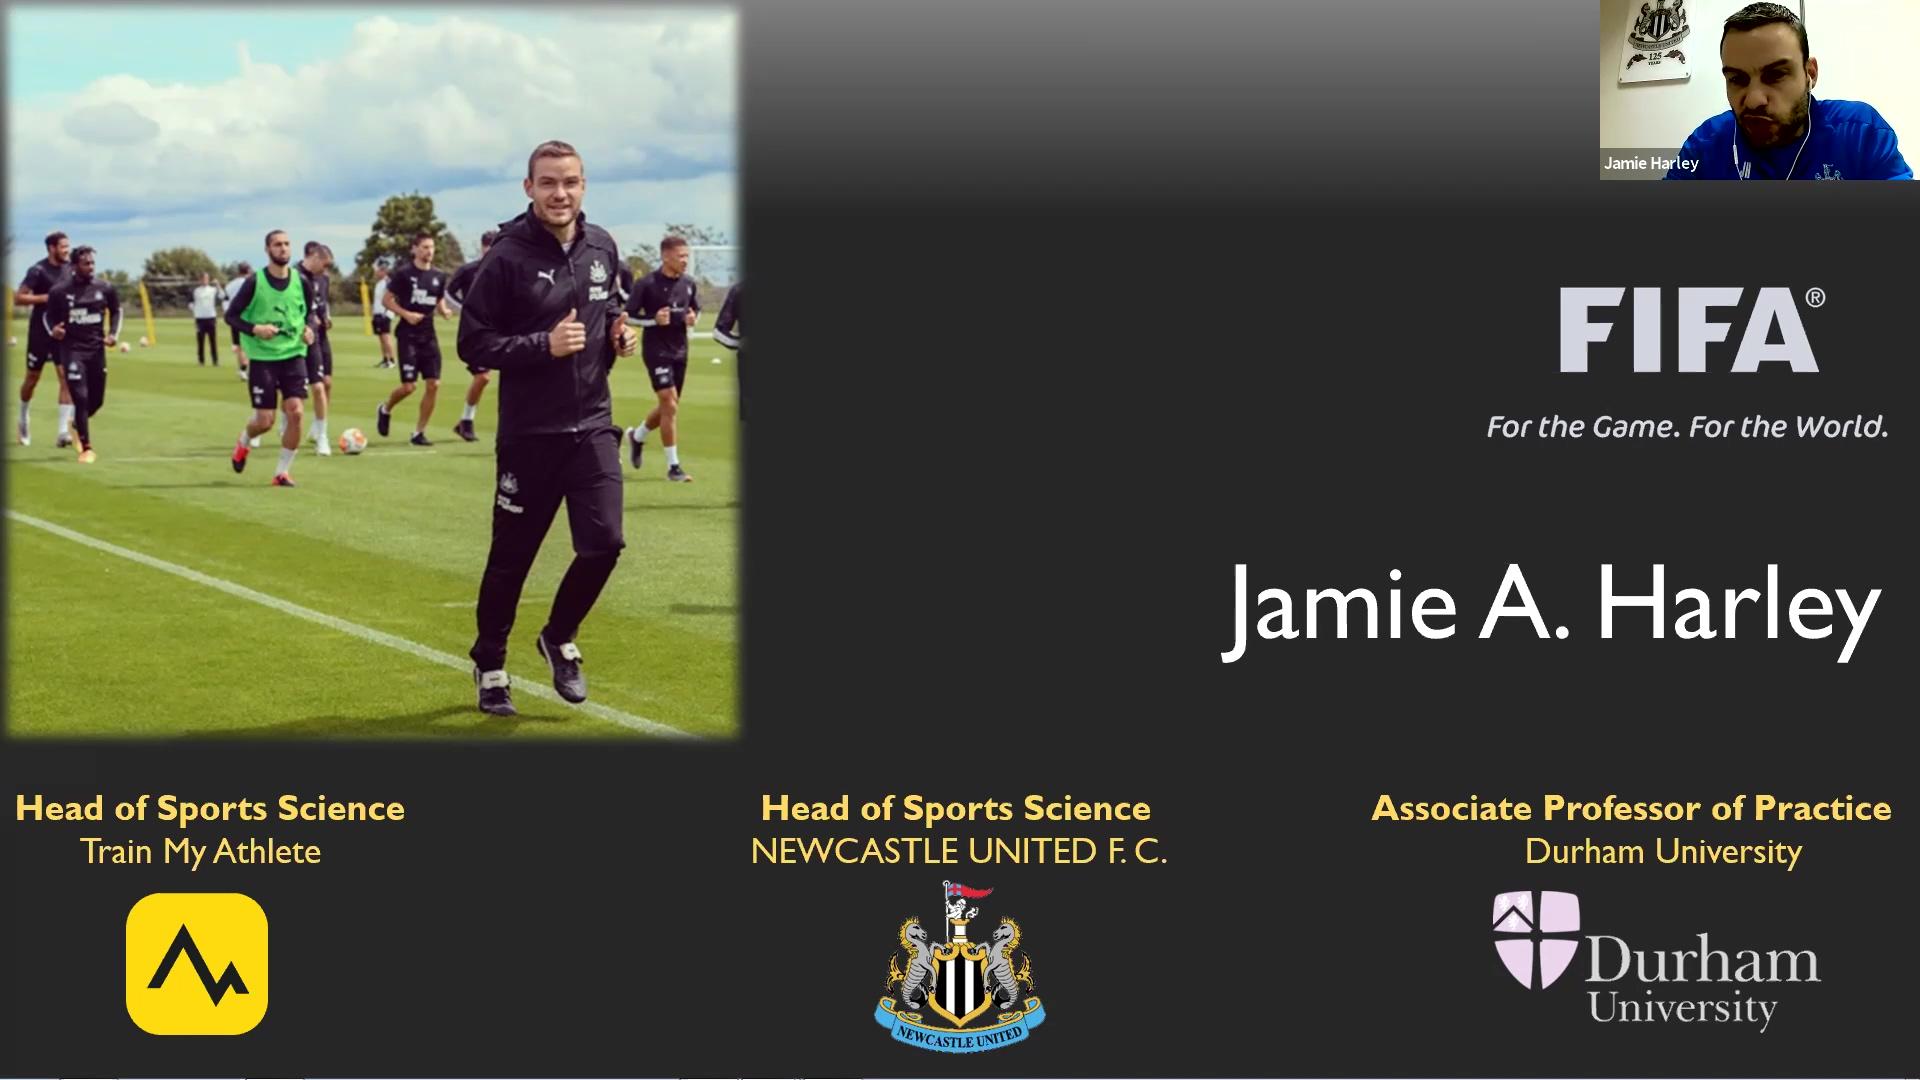 Webinar - Jamie Harley - Catapult Sports Wearable Technology 2